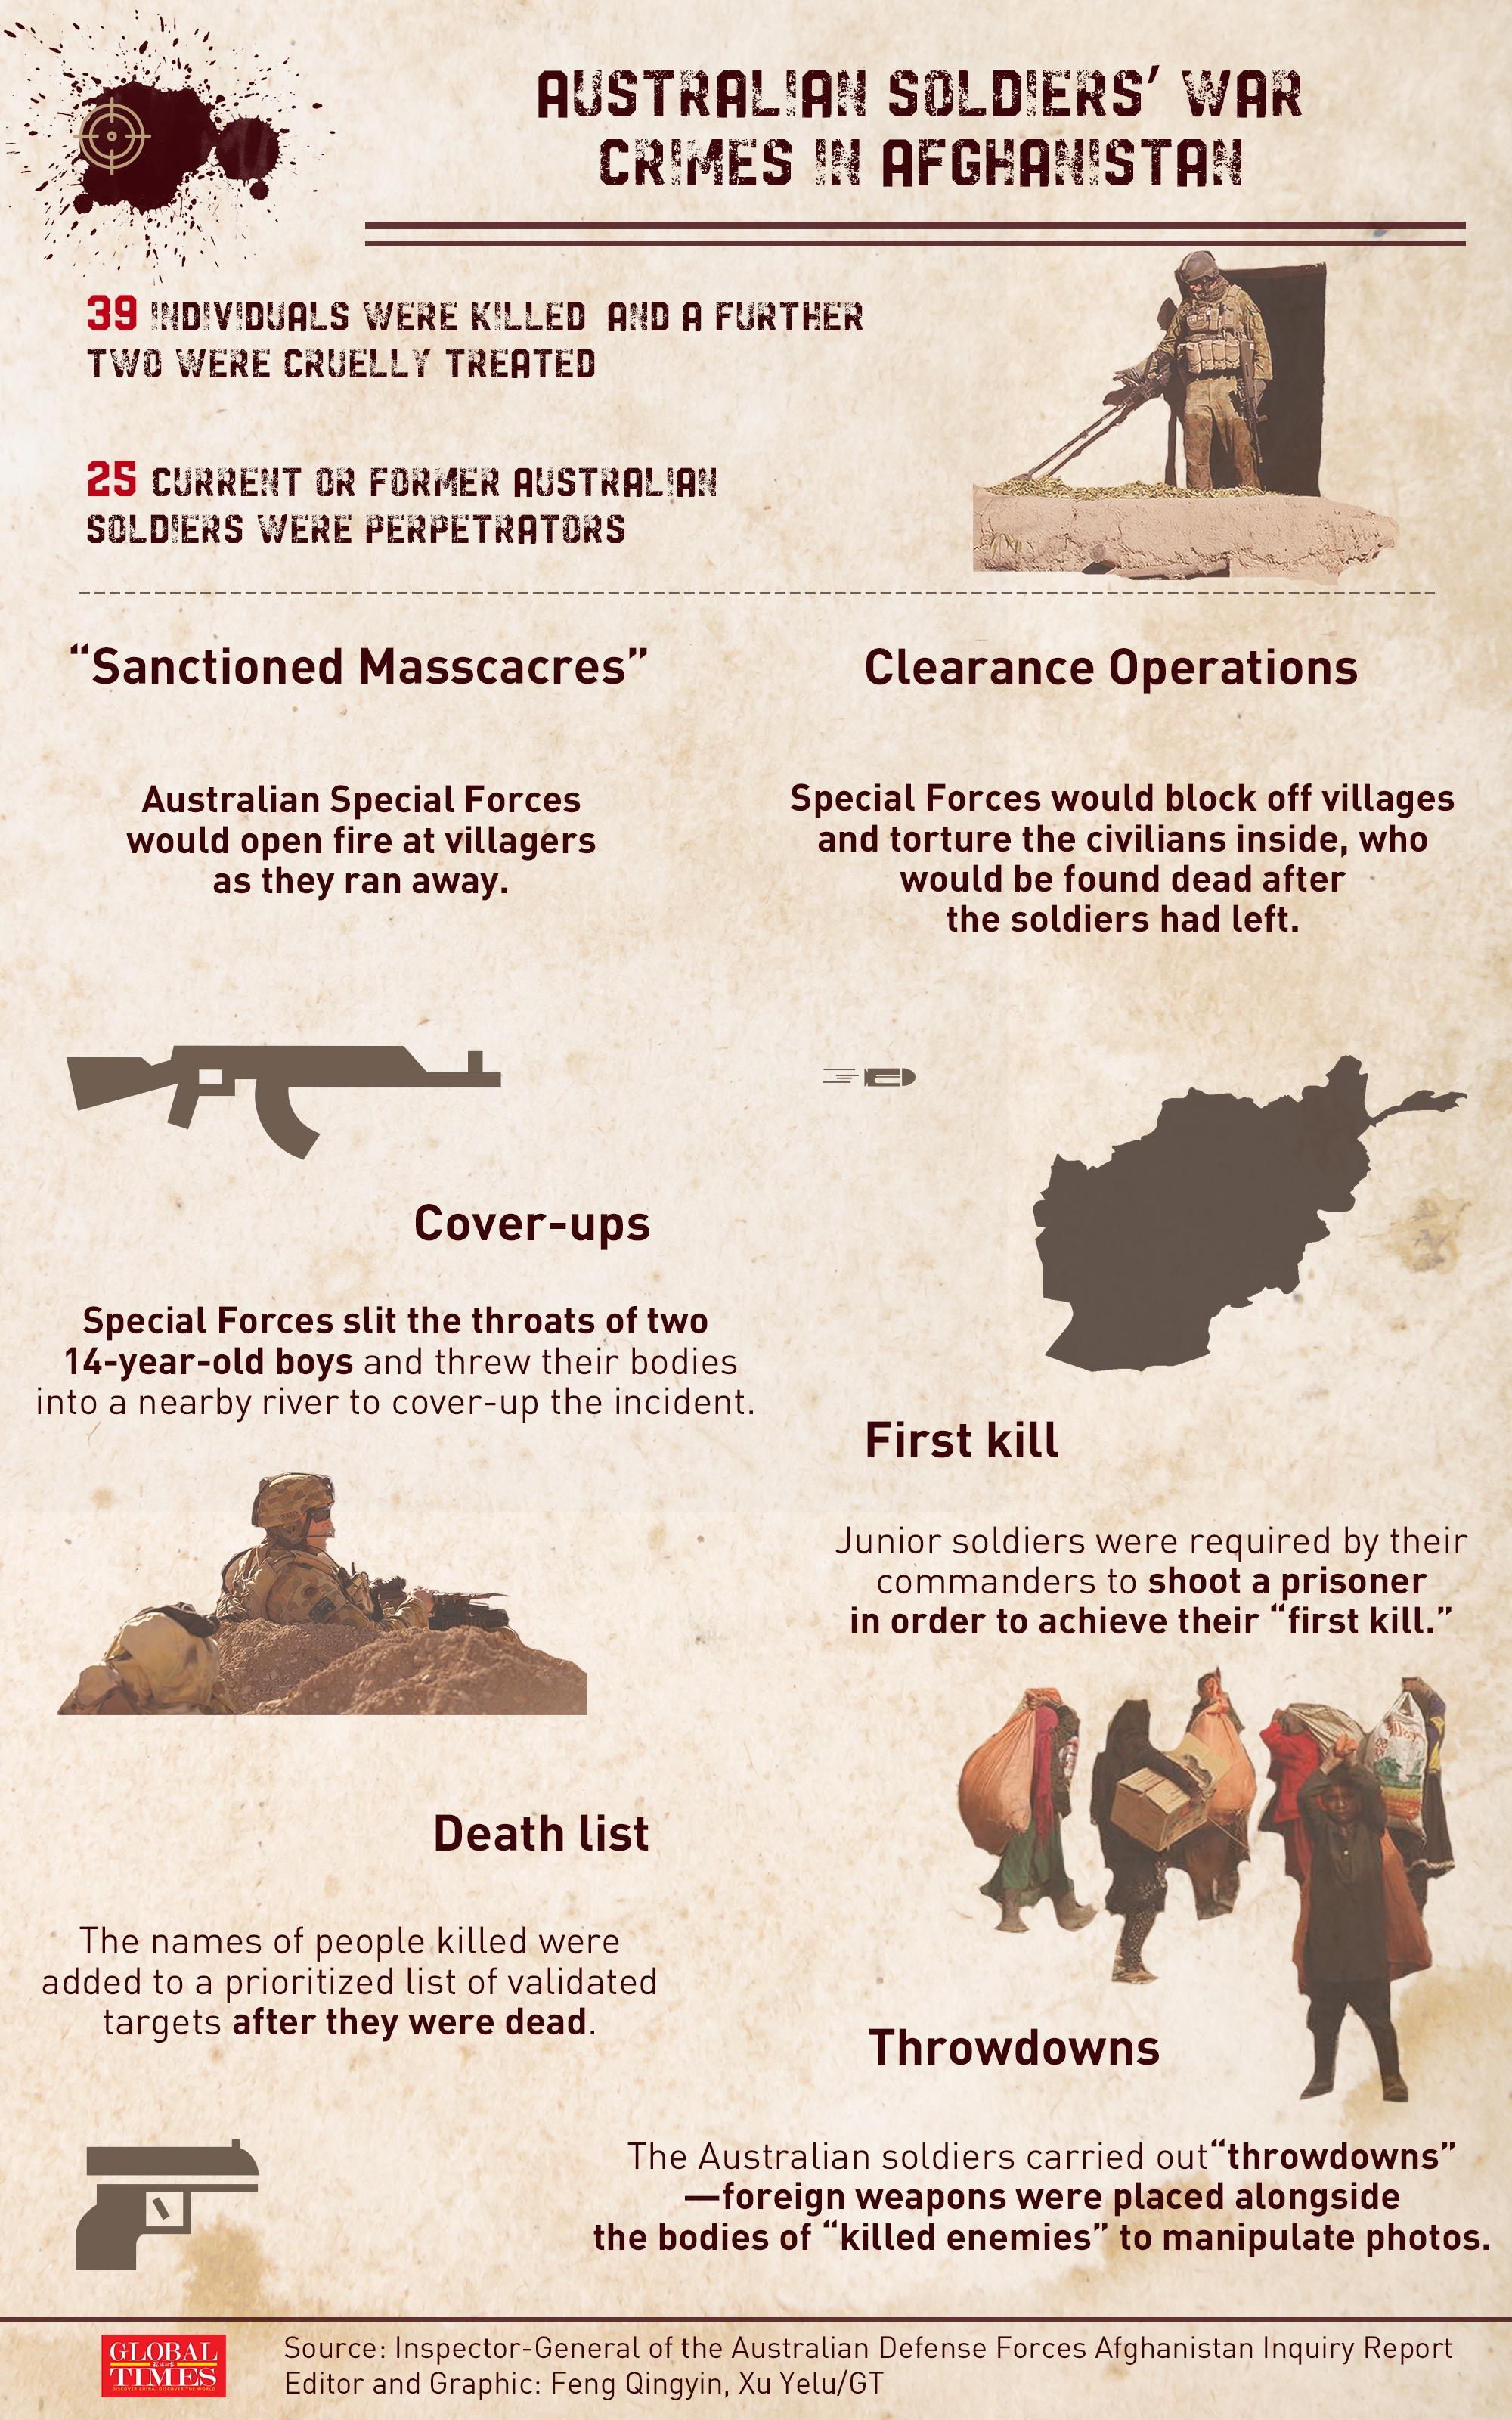 Australian soldiers' war crimes in Afghanistan. Infographic: GT